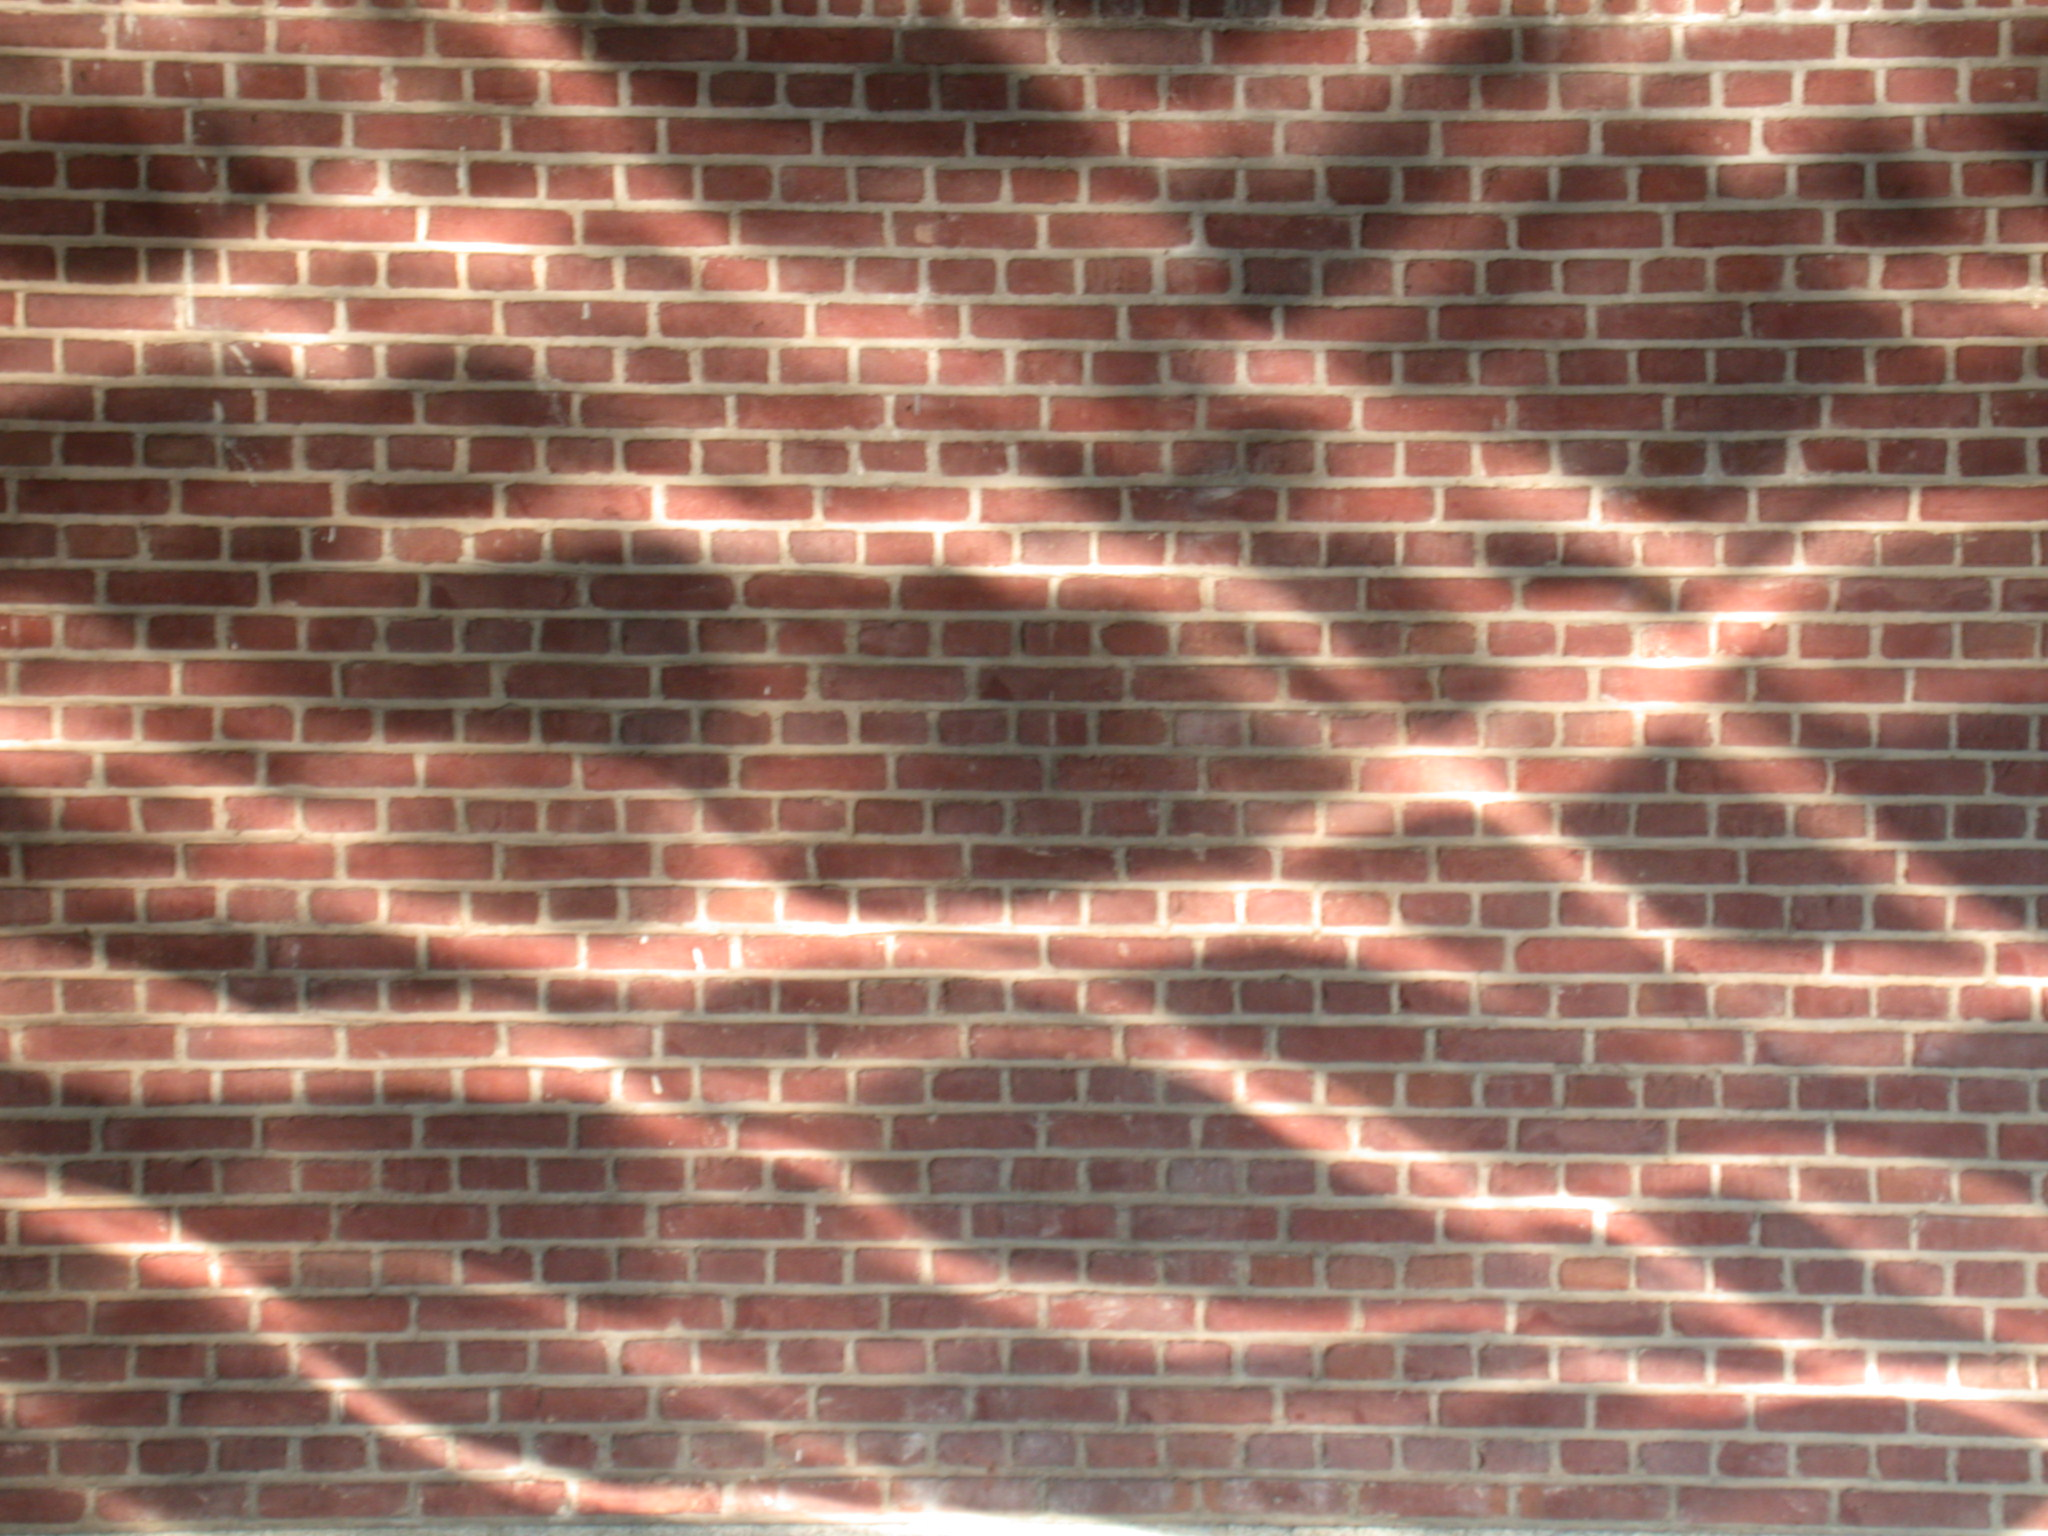 brick wall bricks red wave waves water reflect reflection reflecting lines